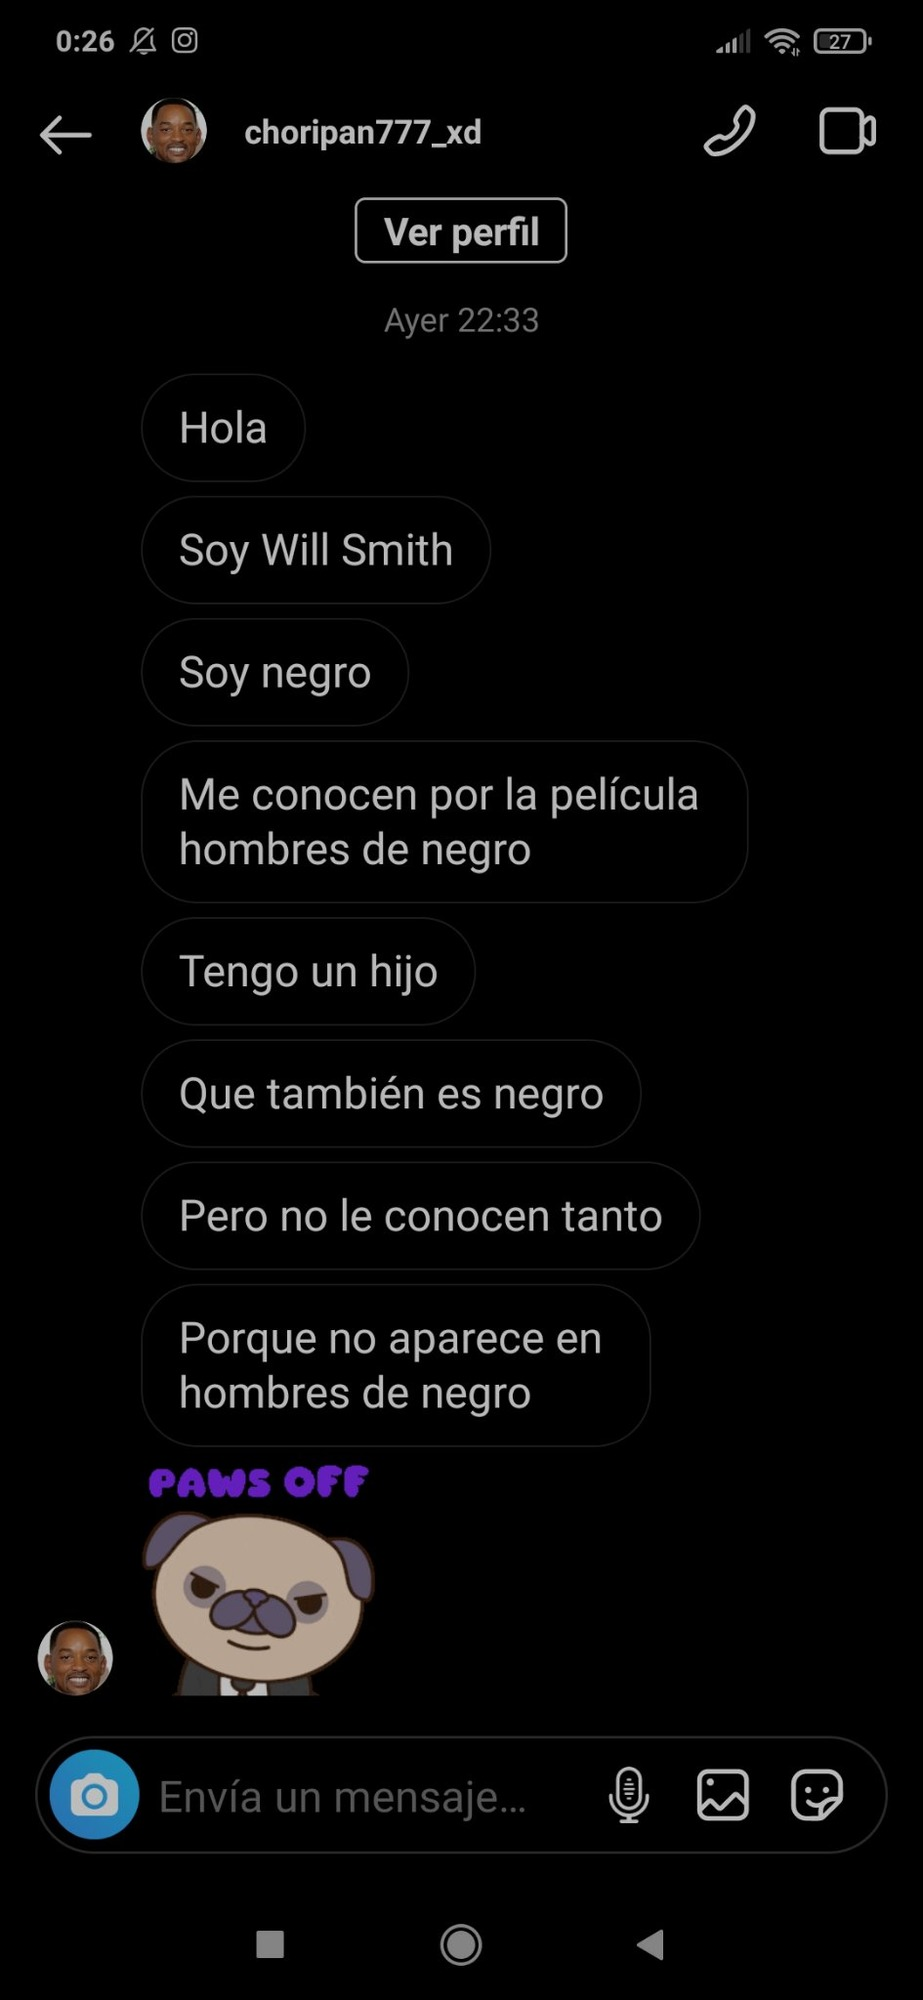 De hombres de negro. - meme